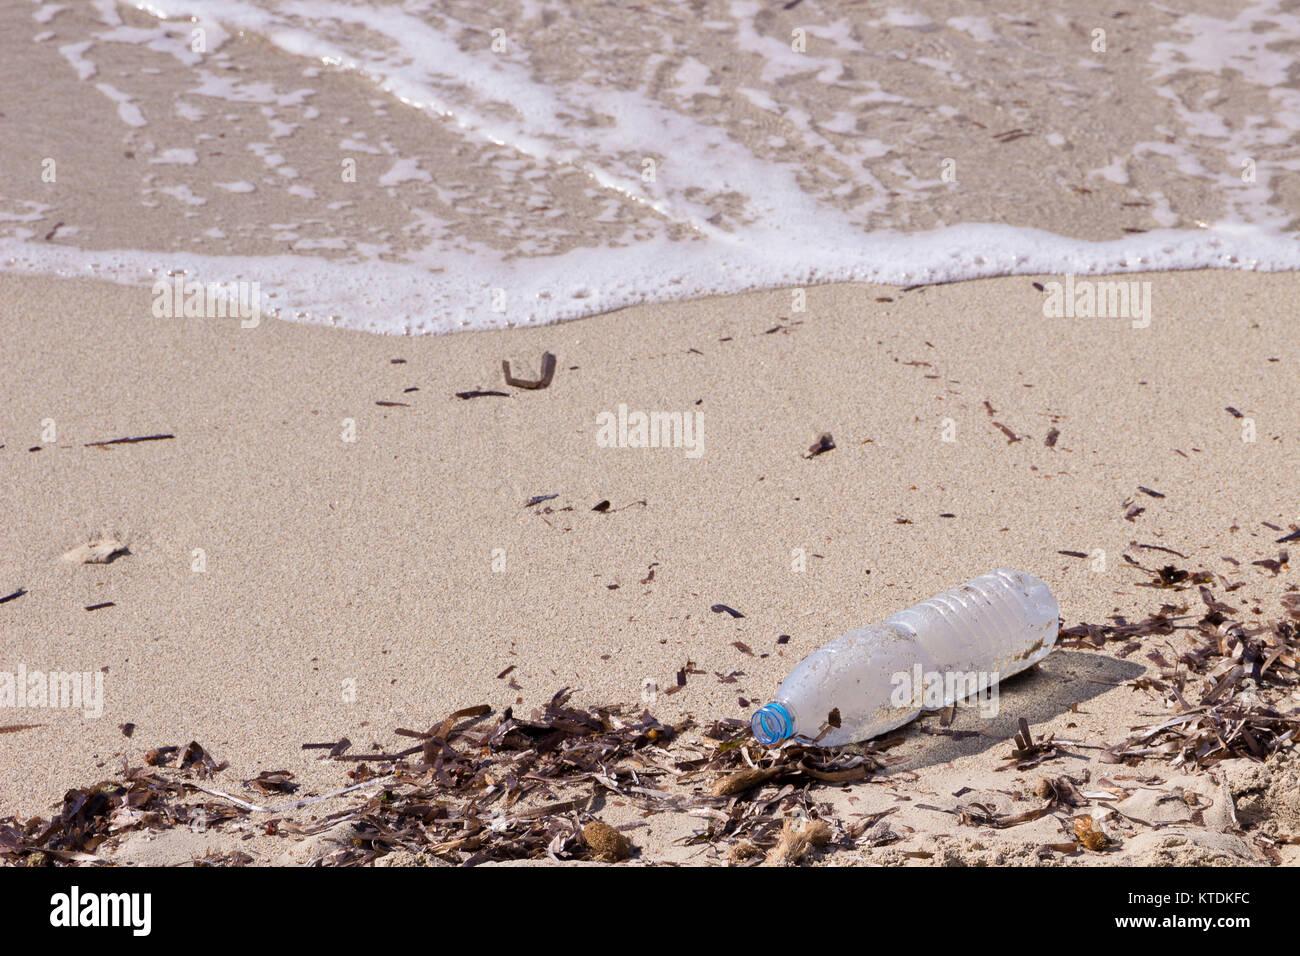 Empty plastic bottle lying on sandy beach at seaside - Stock Image